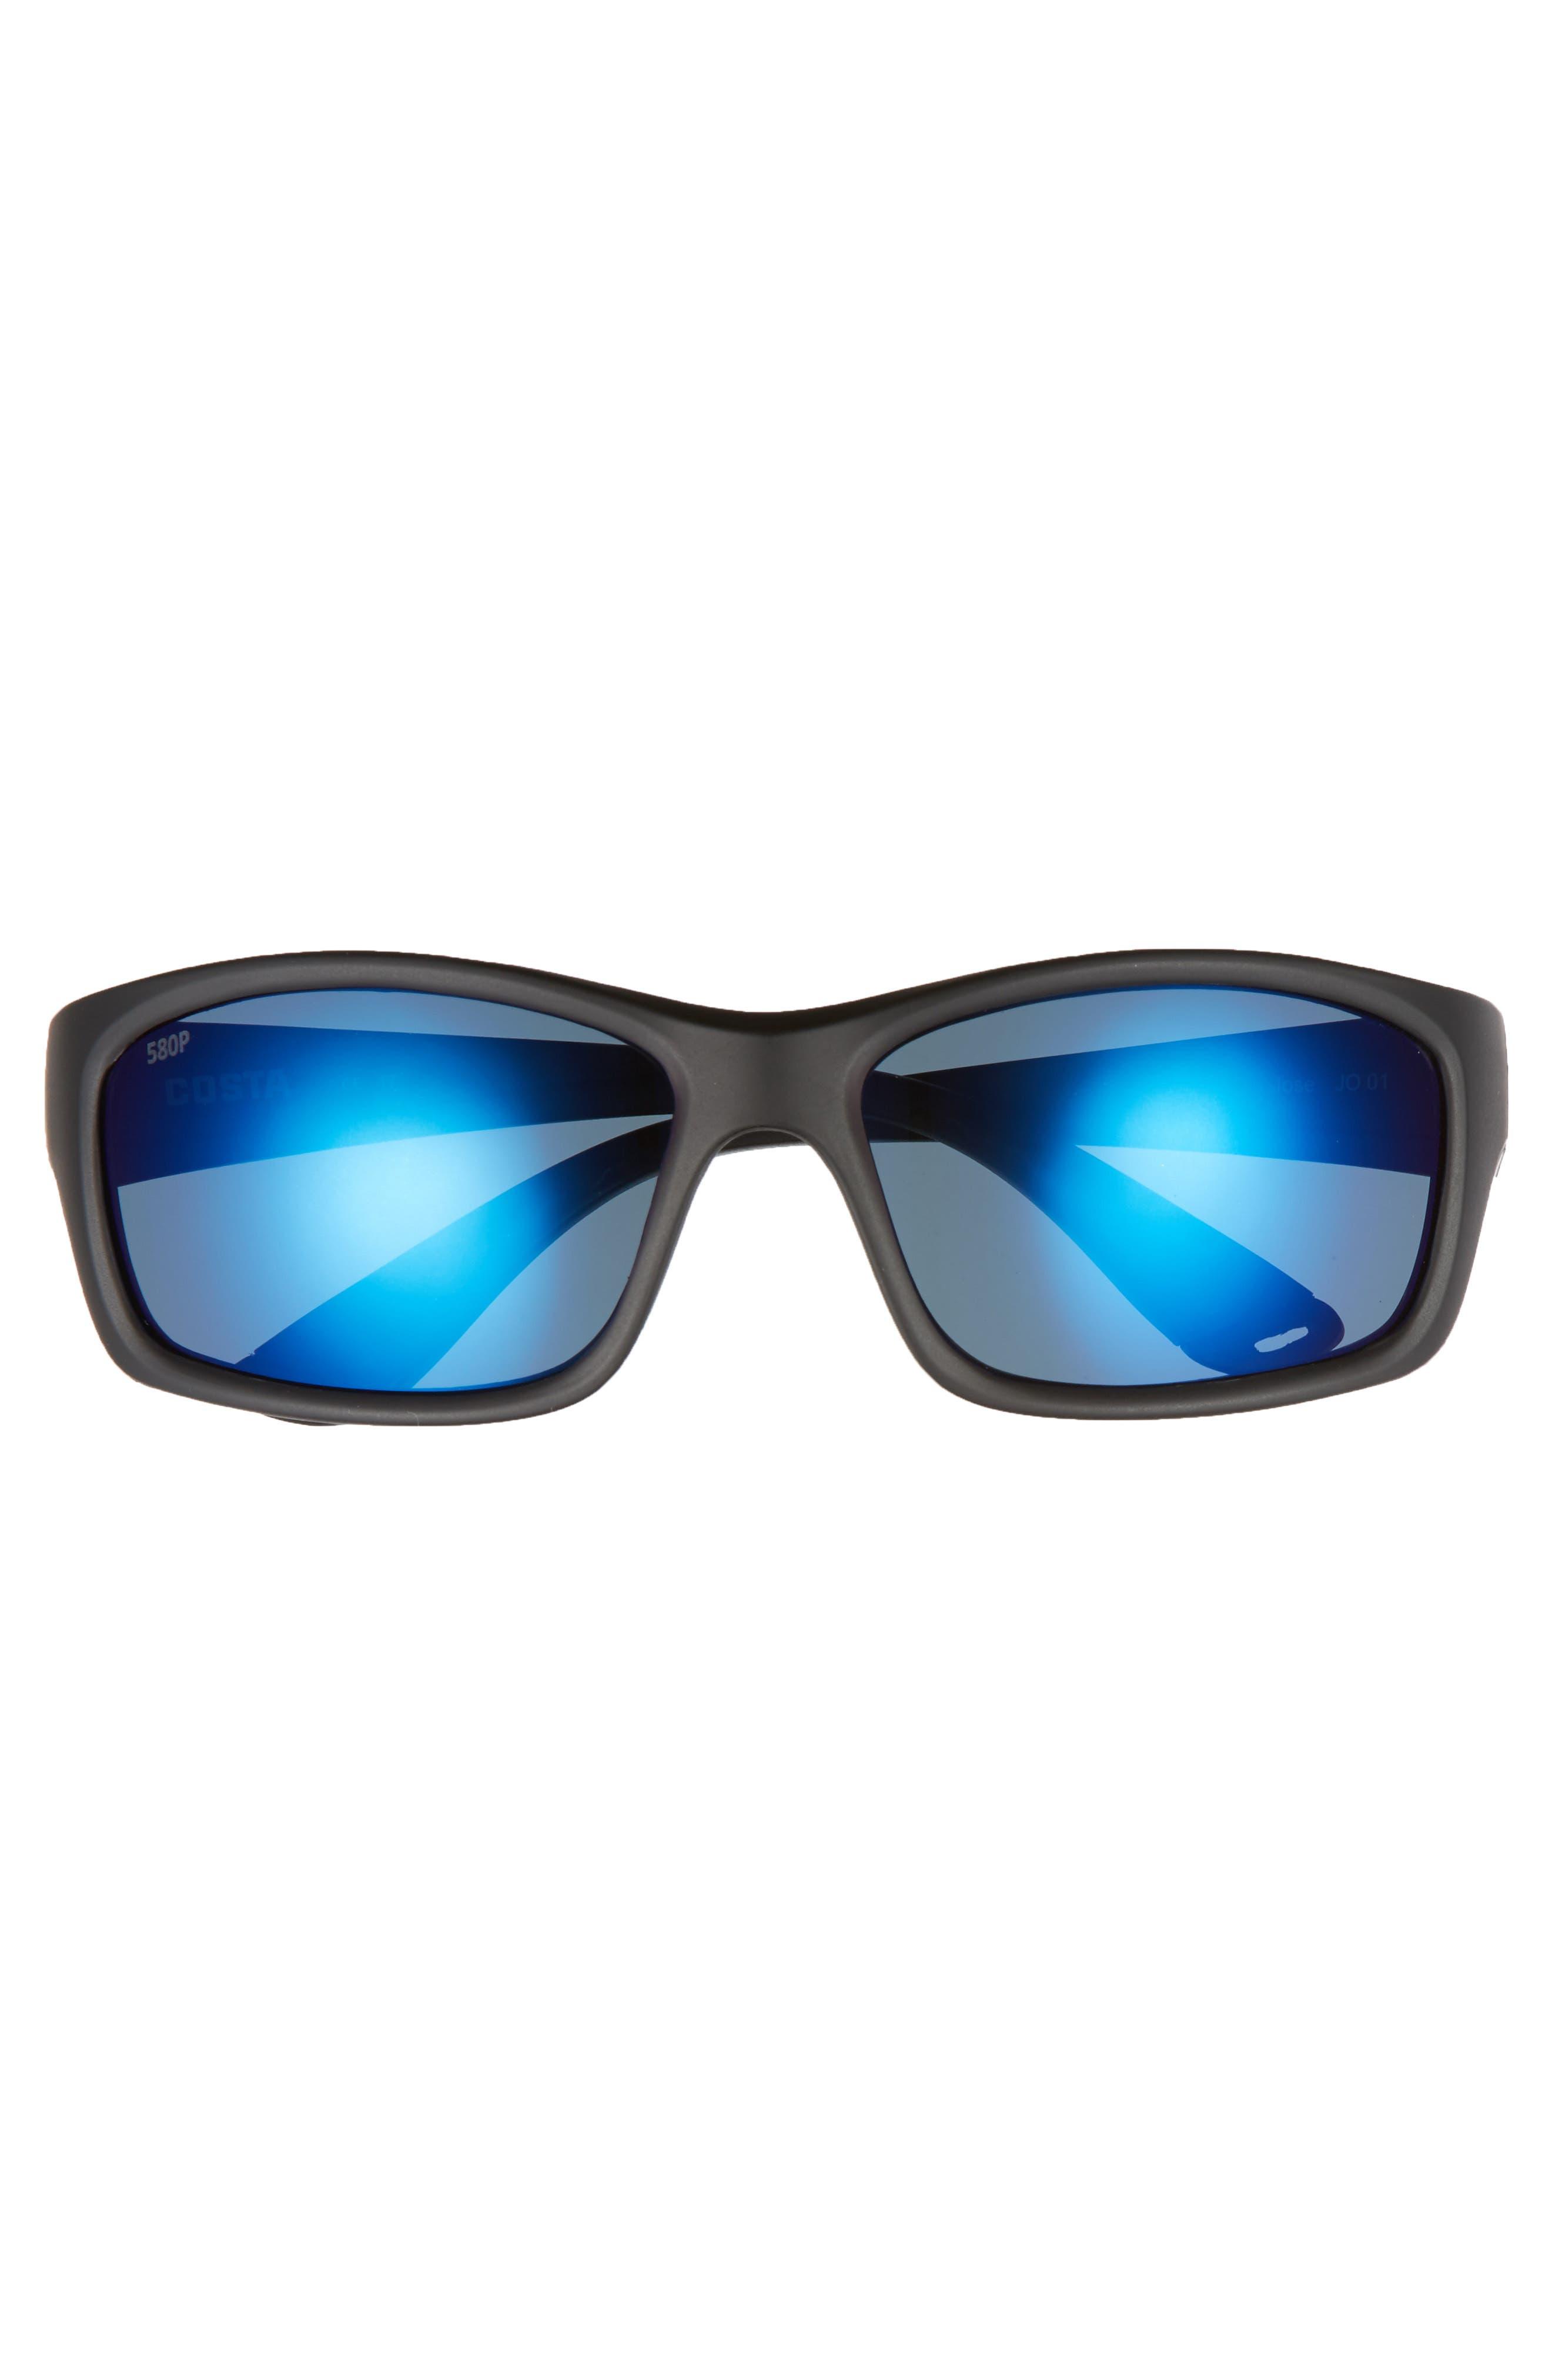 Jose 60mm Polarized Sunglasses,                             Alternate thumbnail 2, color,                             Blackout/ Blue Mirror